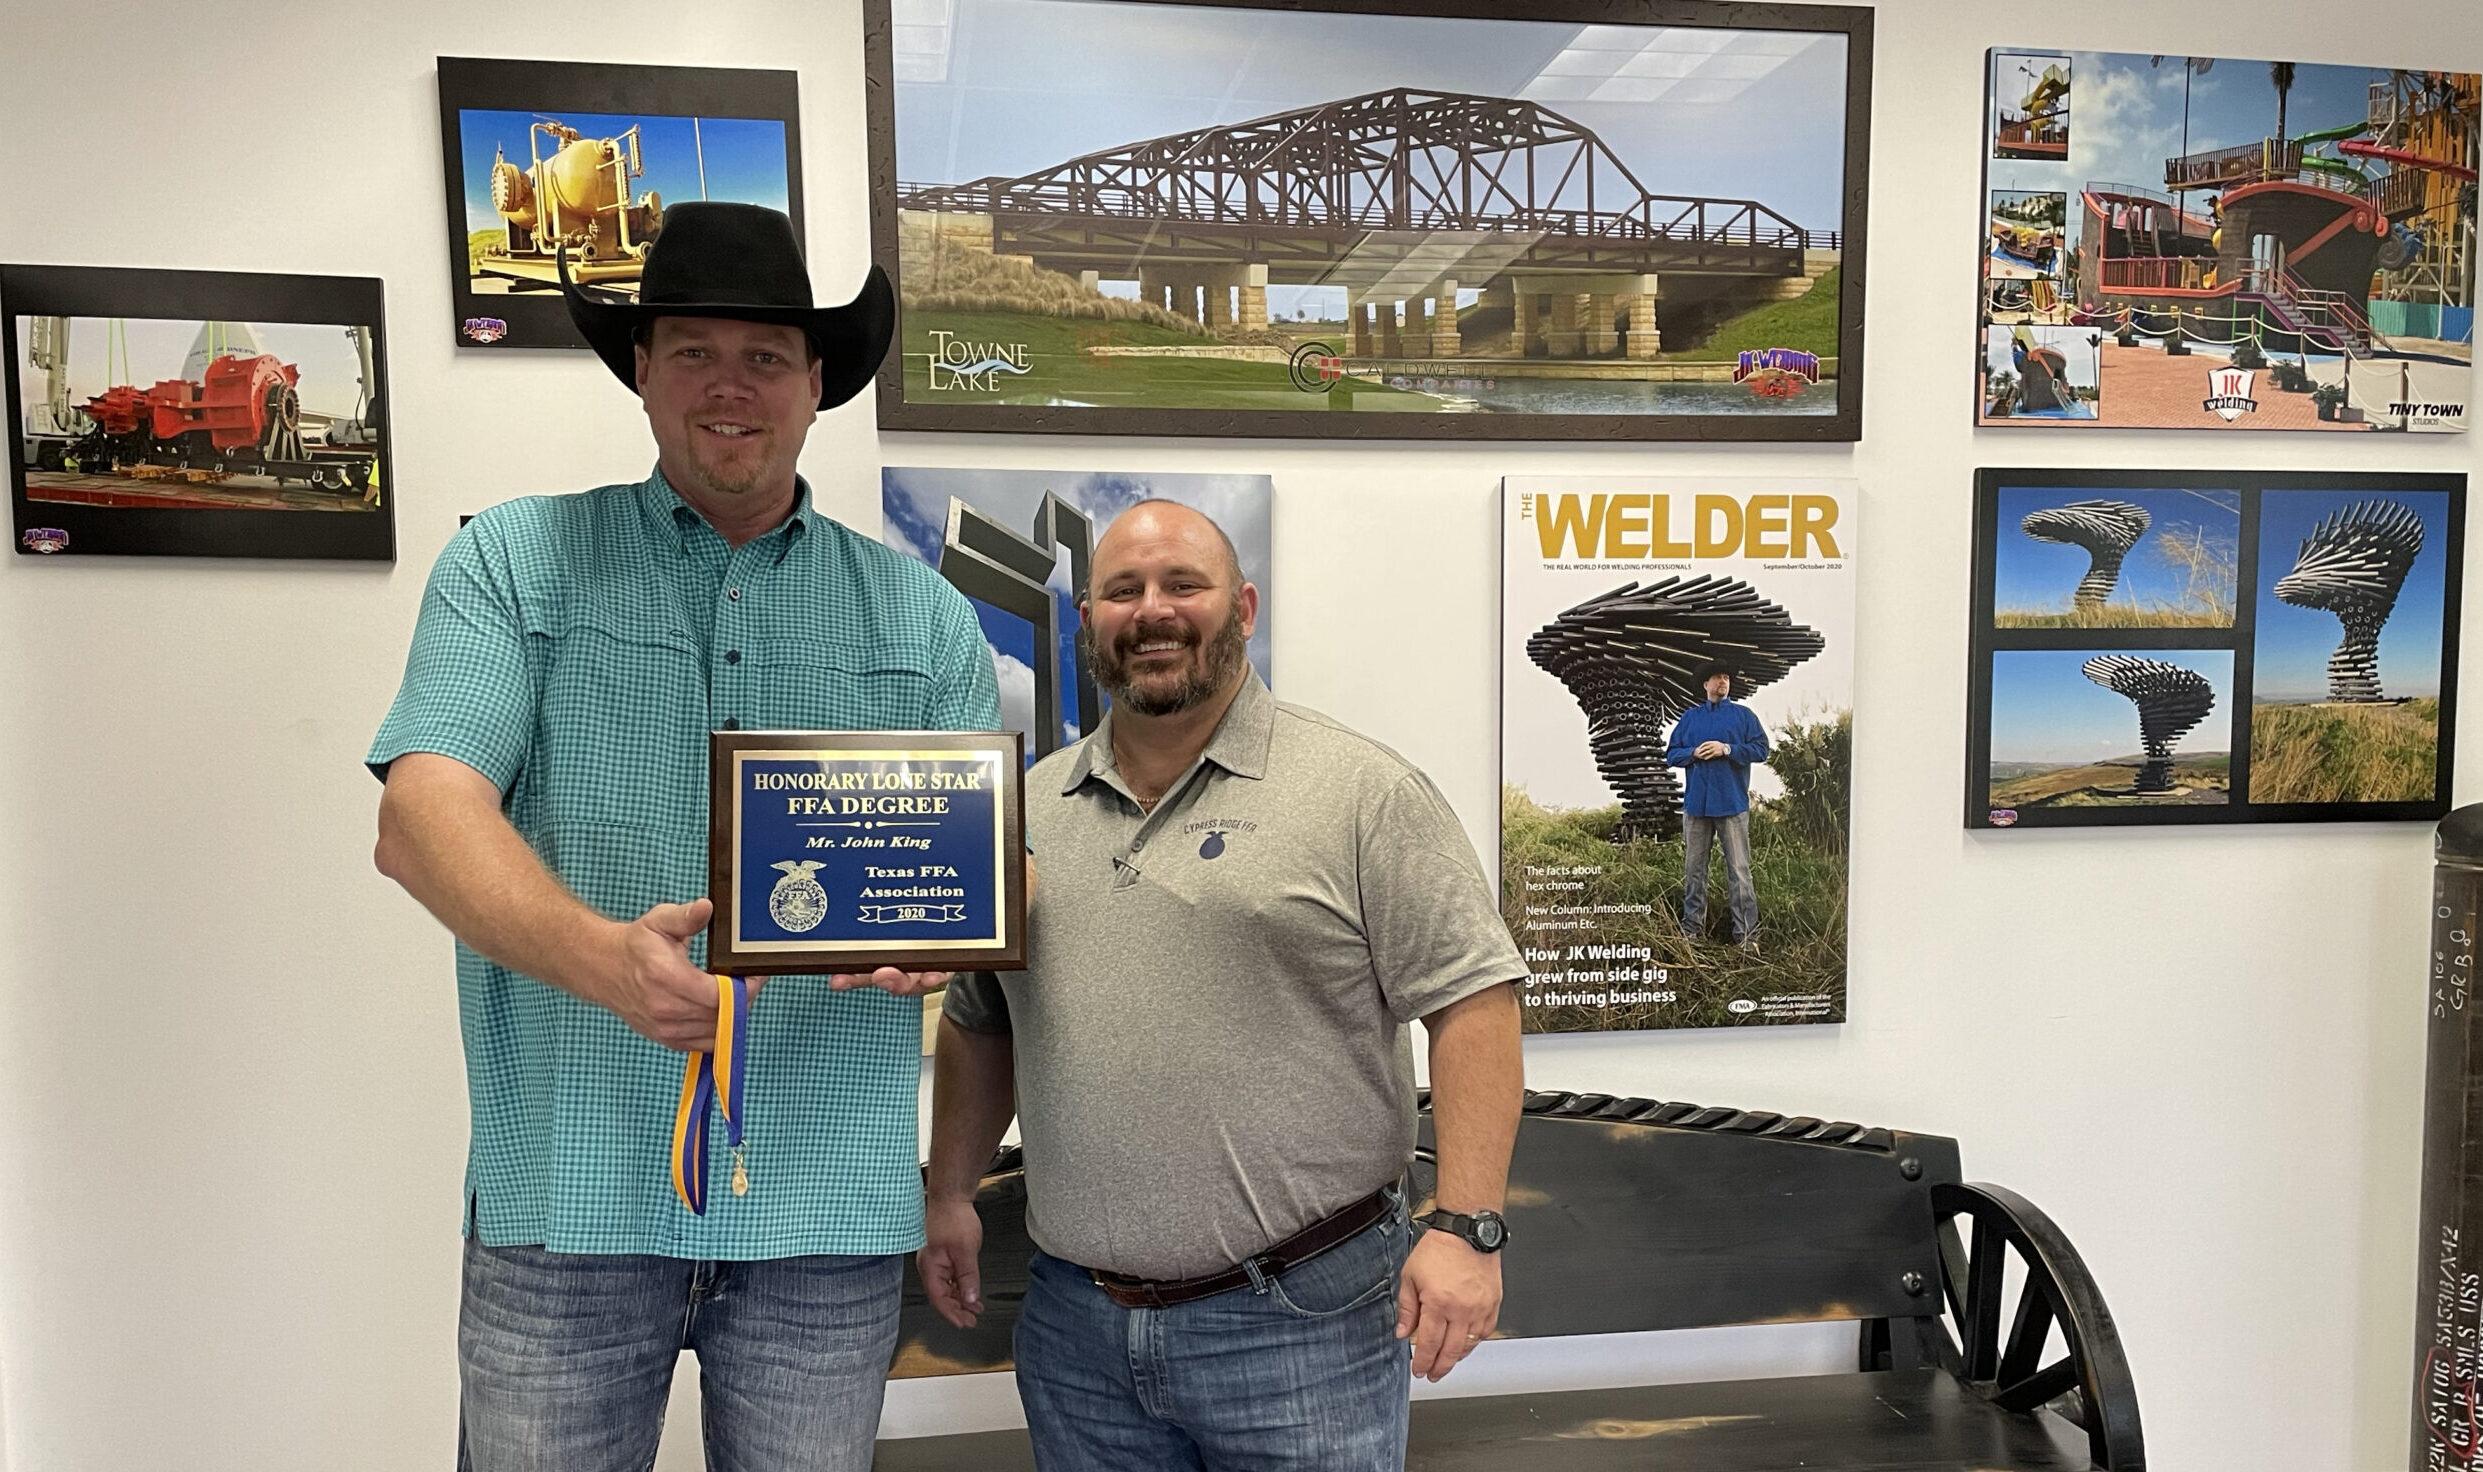 Honorary Lone Star Degree - John King - Texas FFA